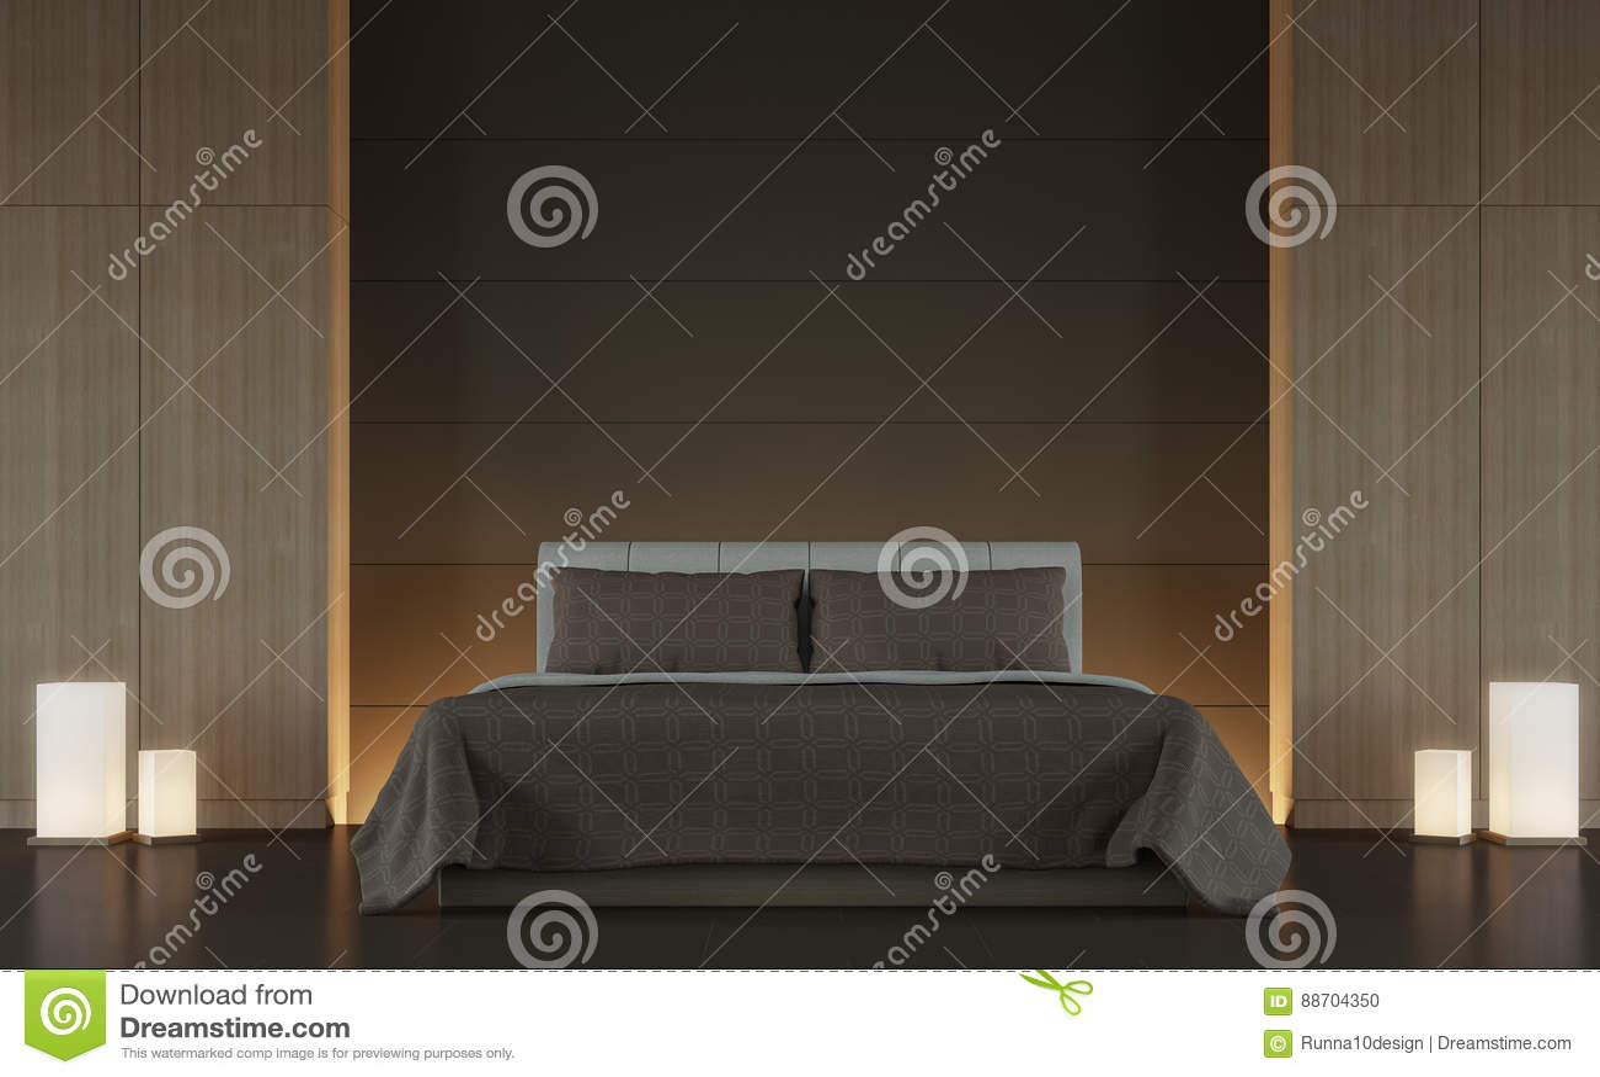 Modern Brown Bedroom Interior Minimal Style 3d Rendering Image Stock ...